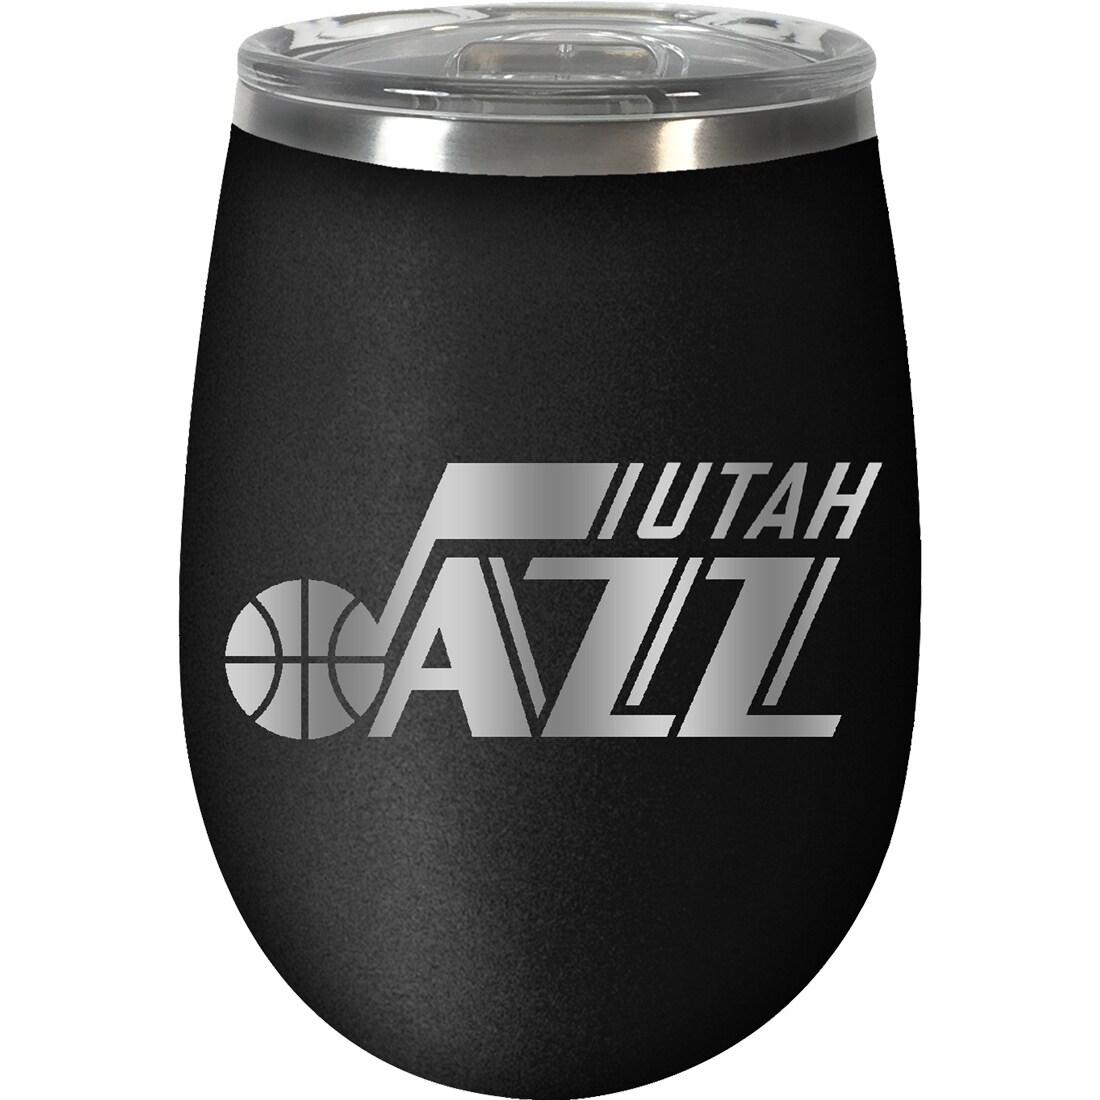 Utah Jazz 12oz. Stealth Wine Tumbler